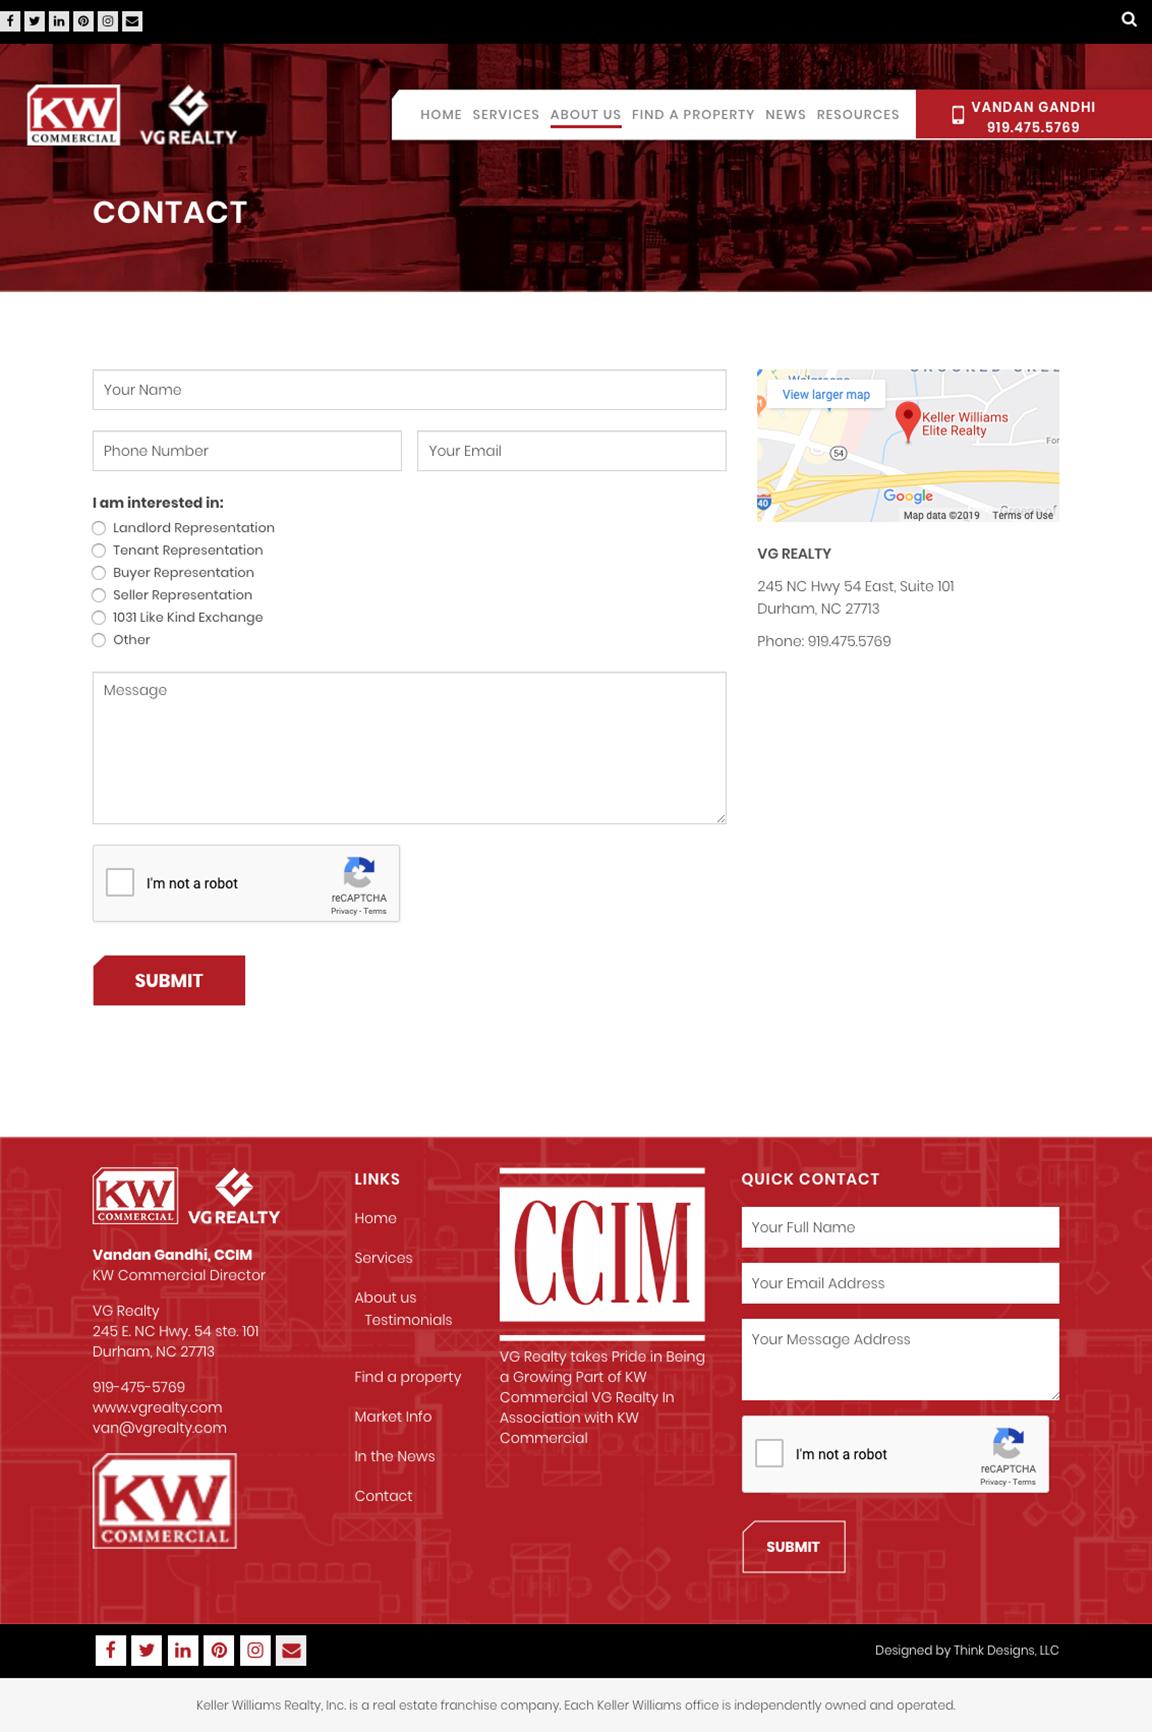 Vg Realty Web Design Think Designs